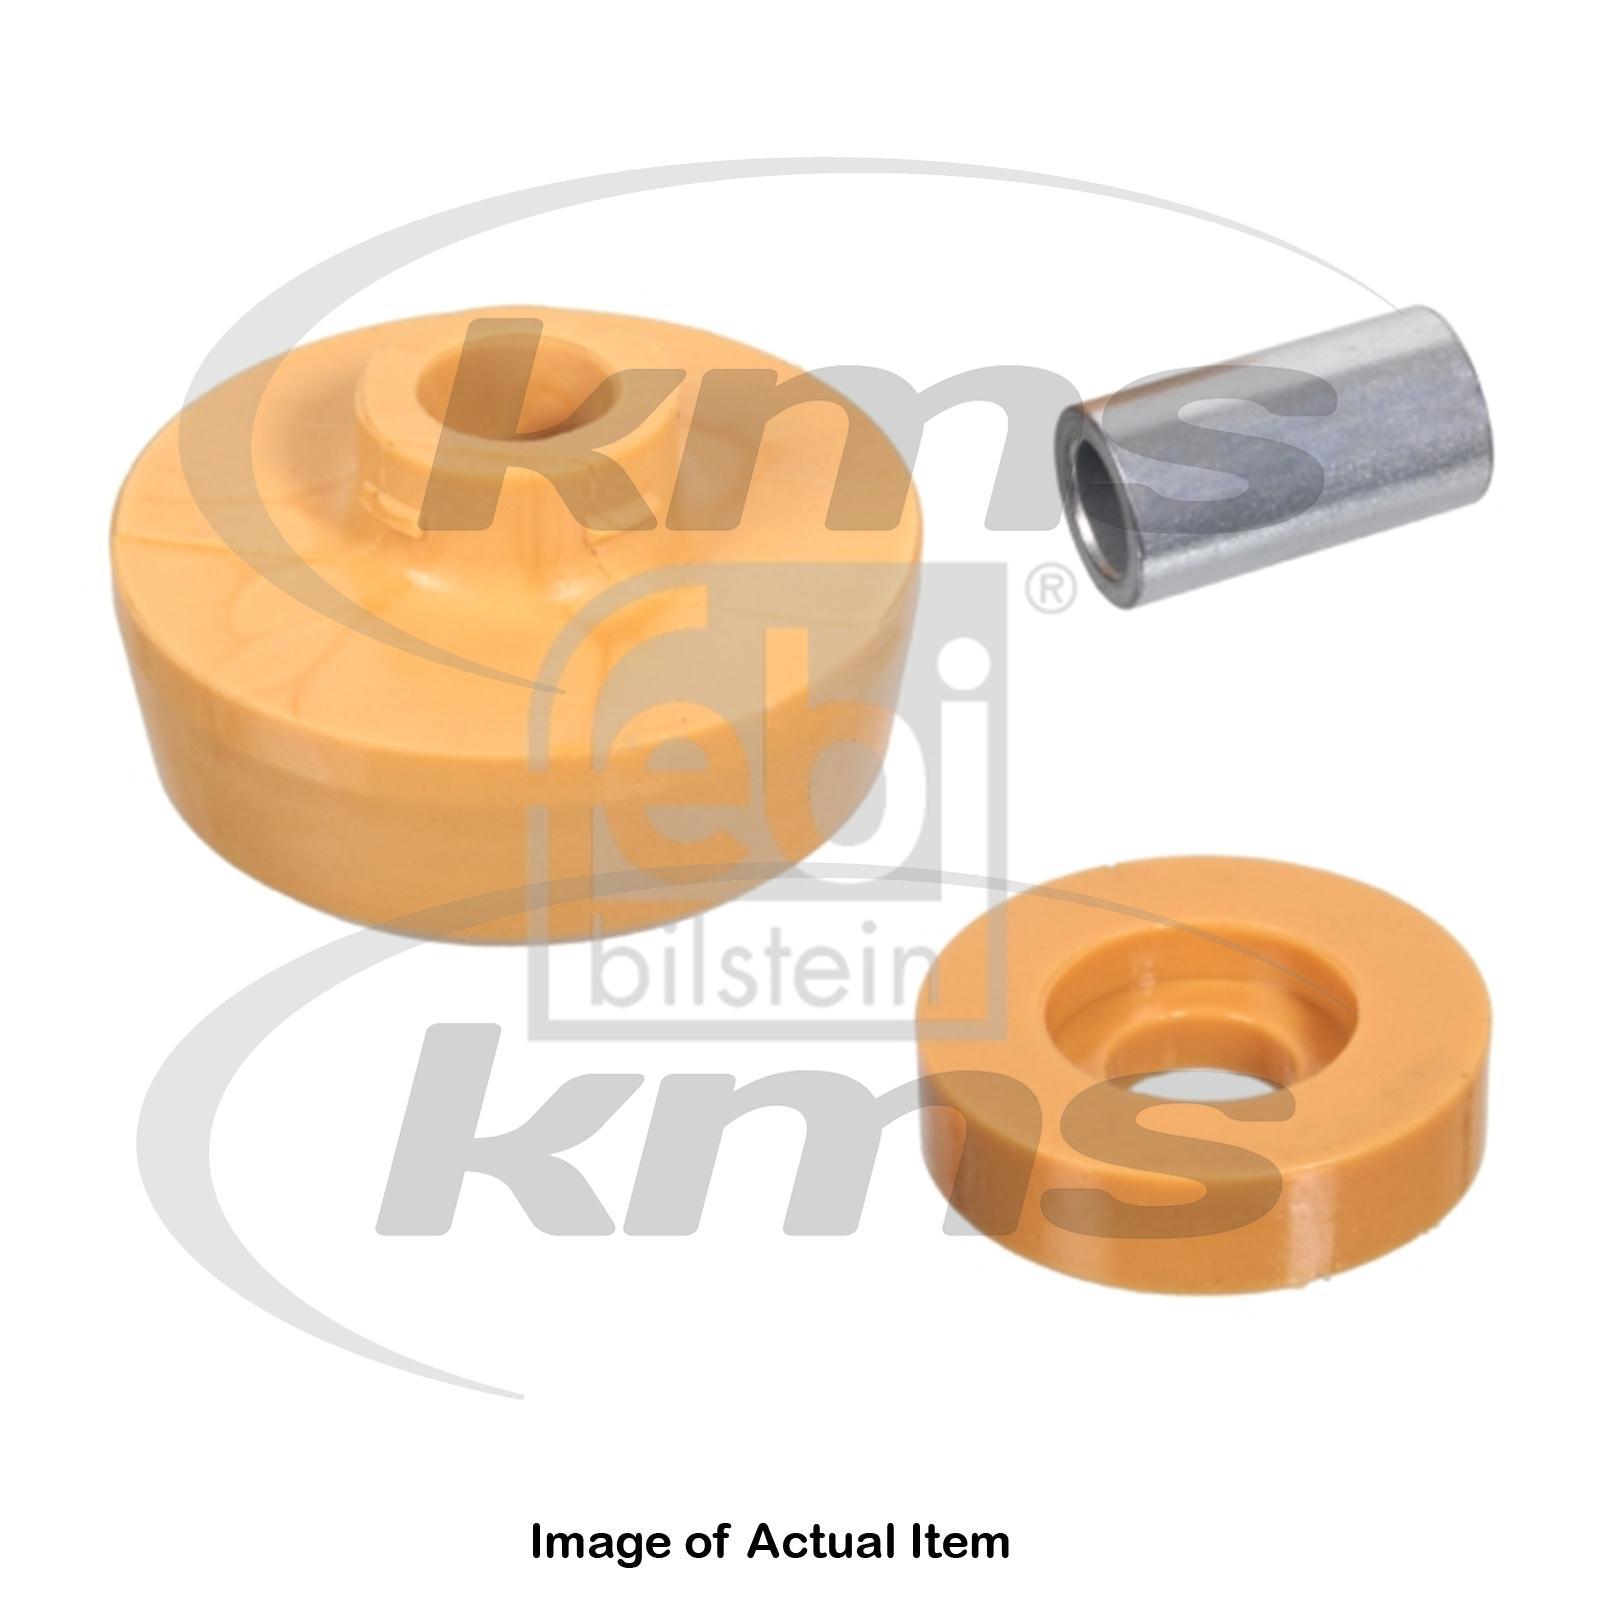 FEBI BILSTEIN Rubber Buffer suspension 07730